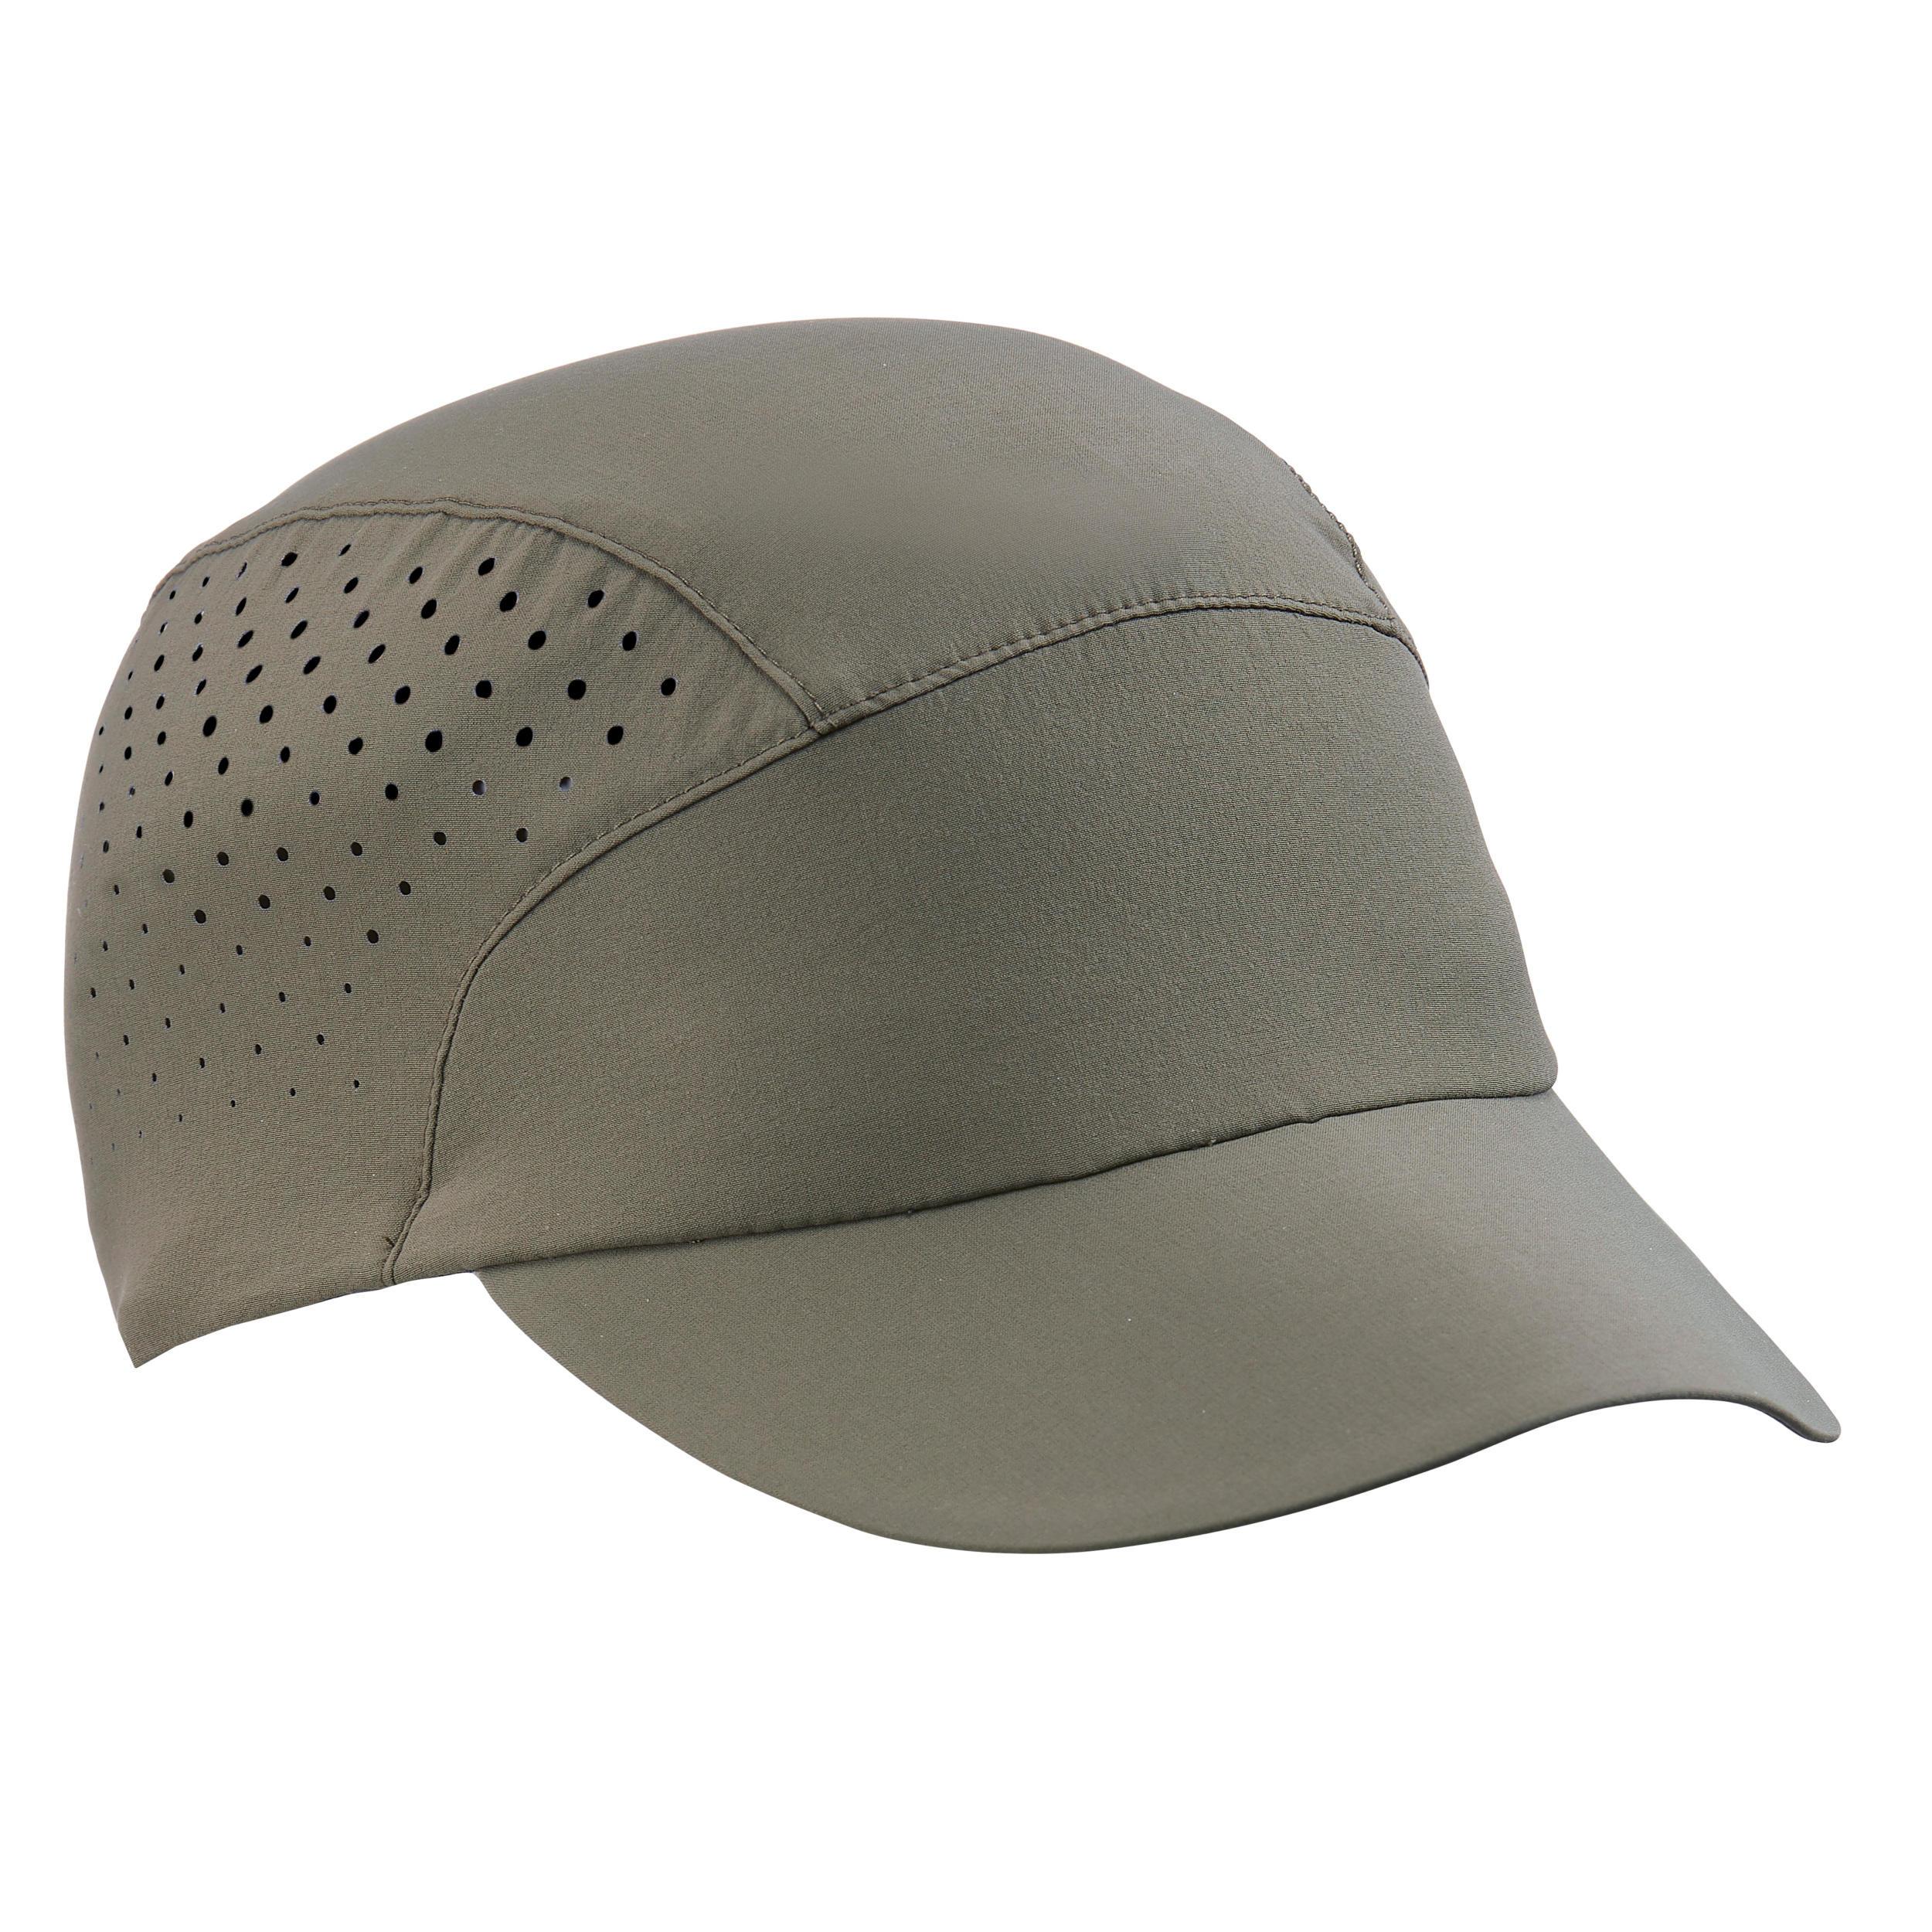 Șapcă CompactăTREK500 Kaki imagine